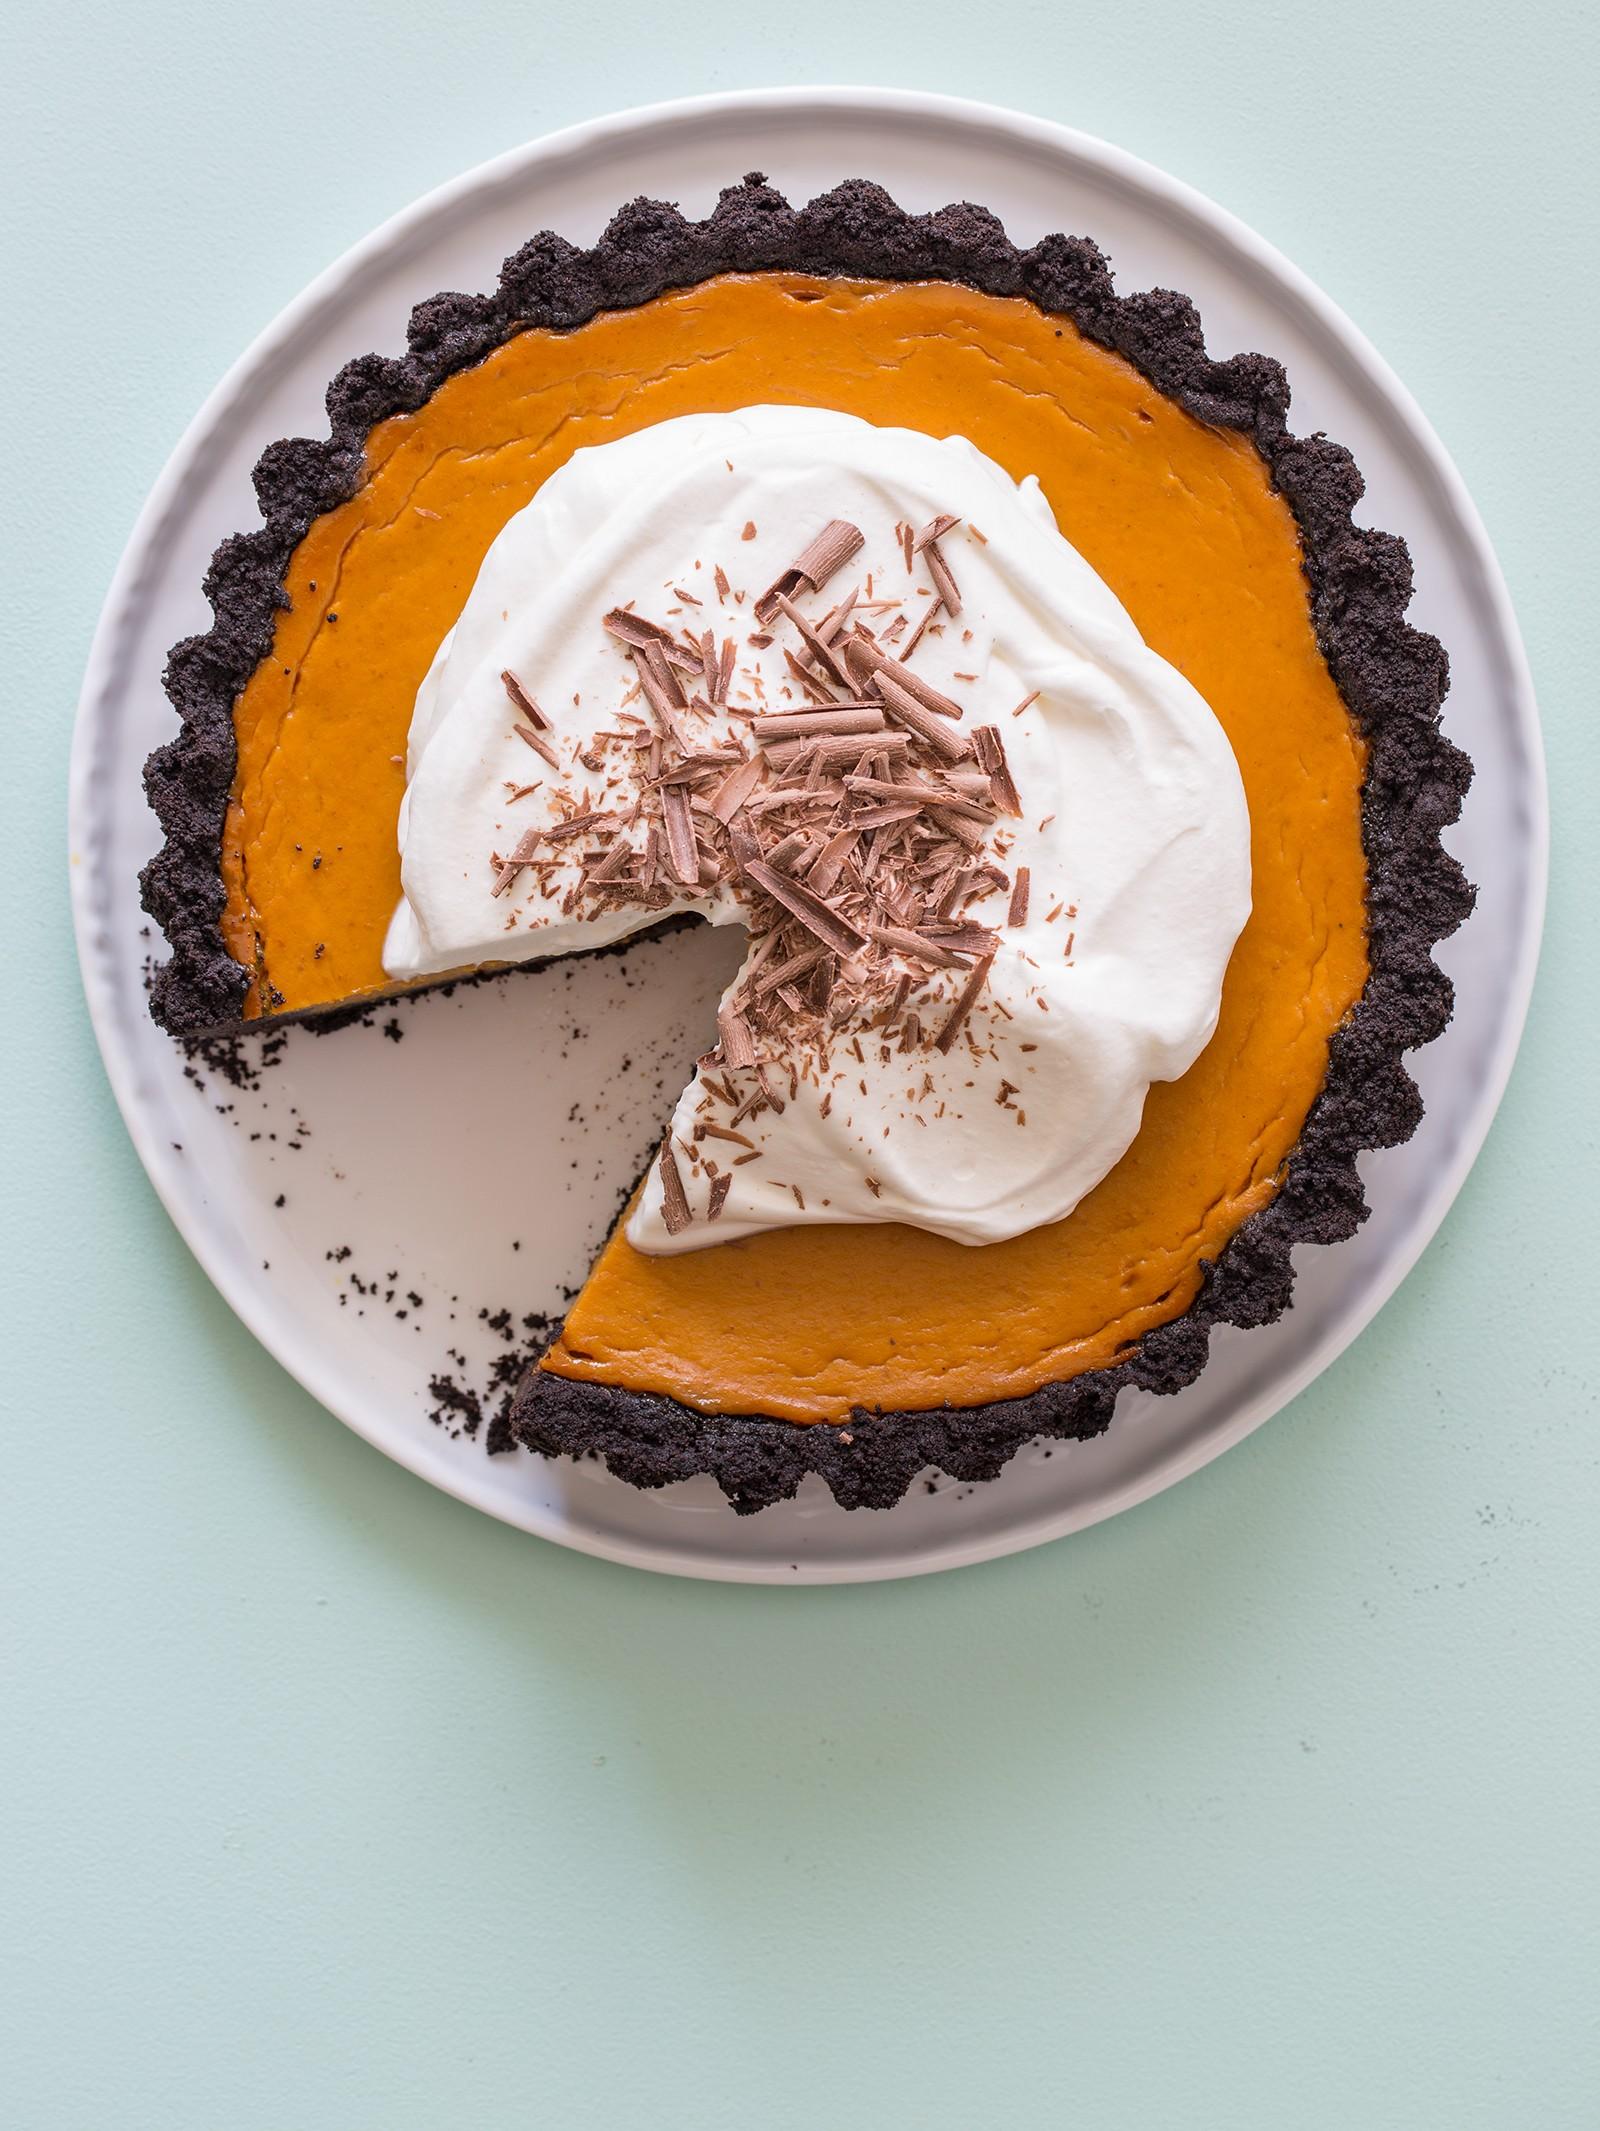 chocolate-crust-pumpkin-piejpg